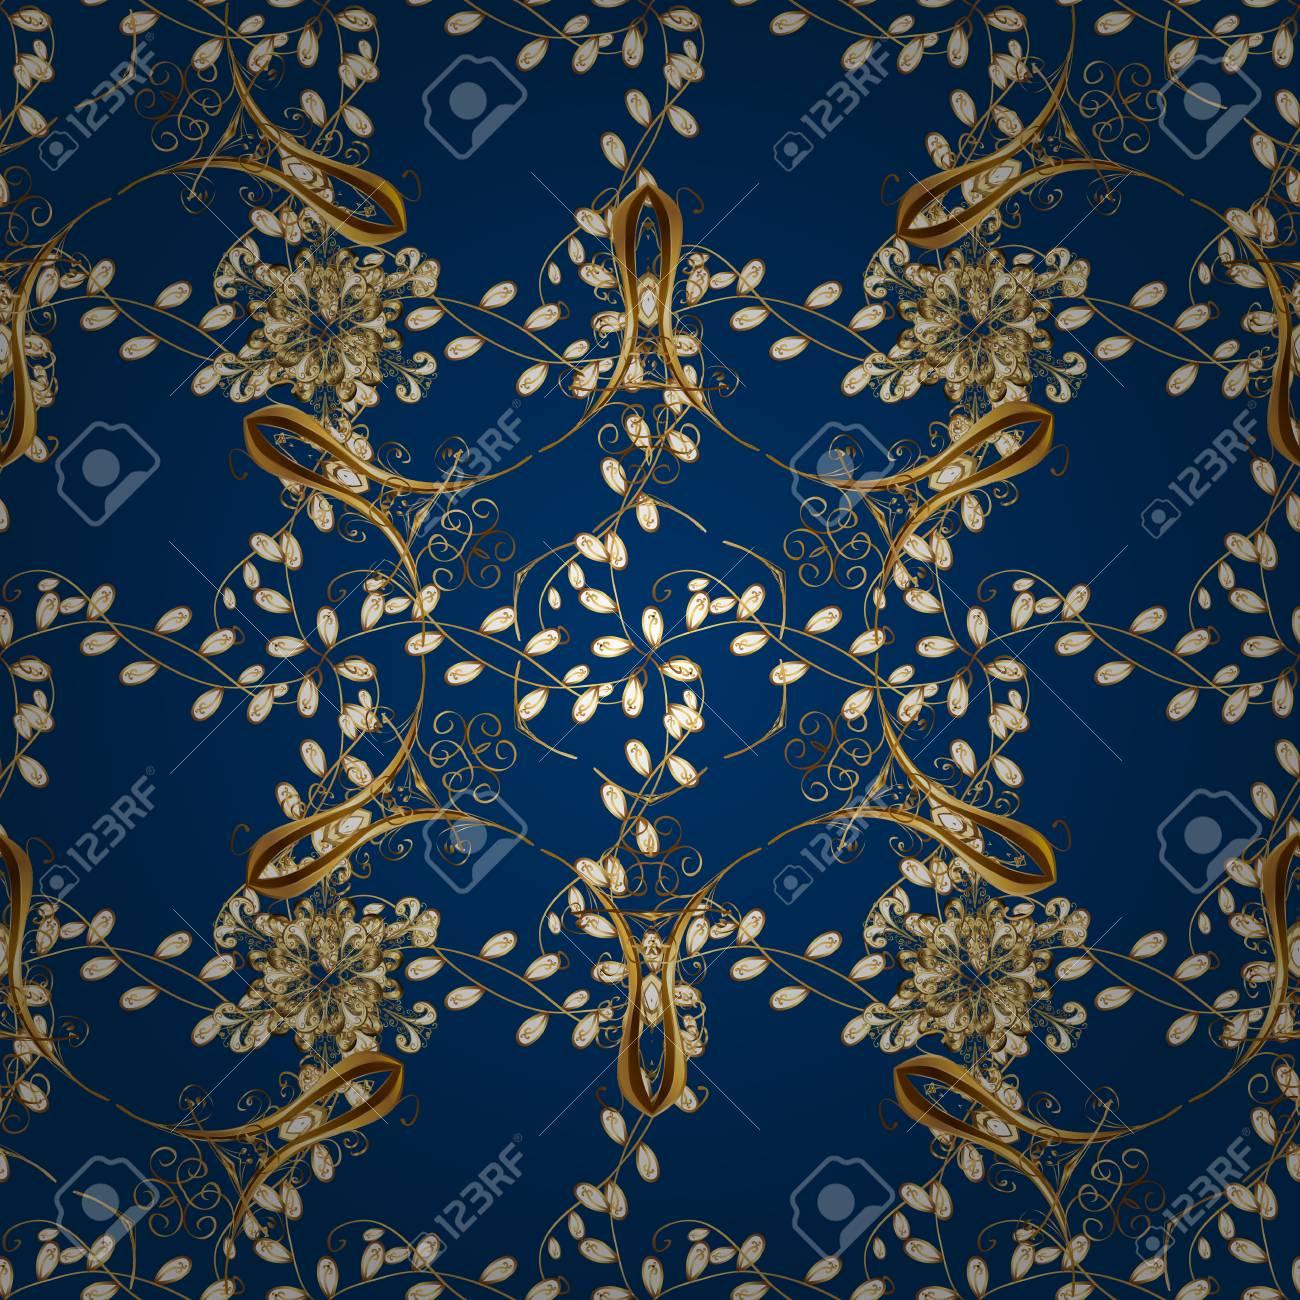 Seamless Vintage Pattern On Dark Blue Background With Golden ...